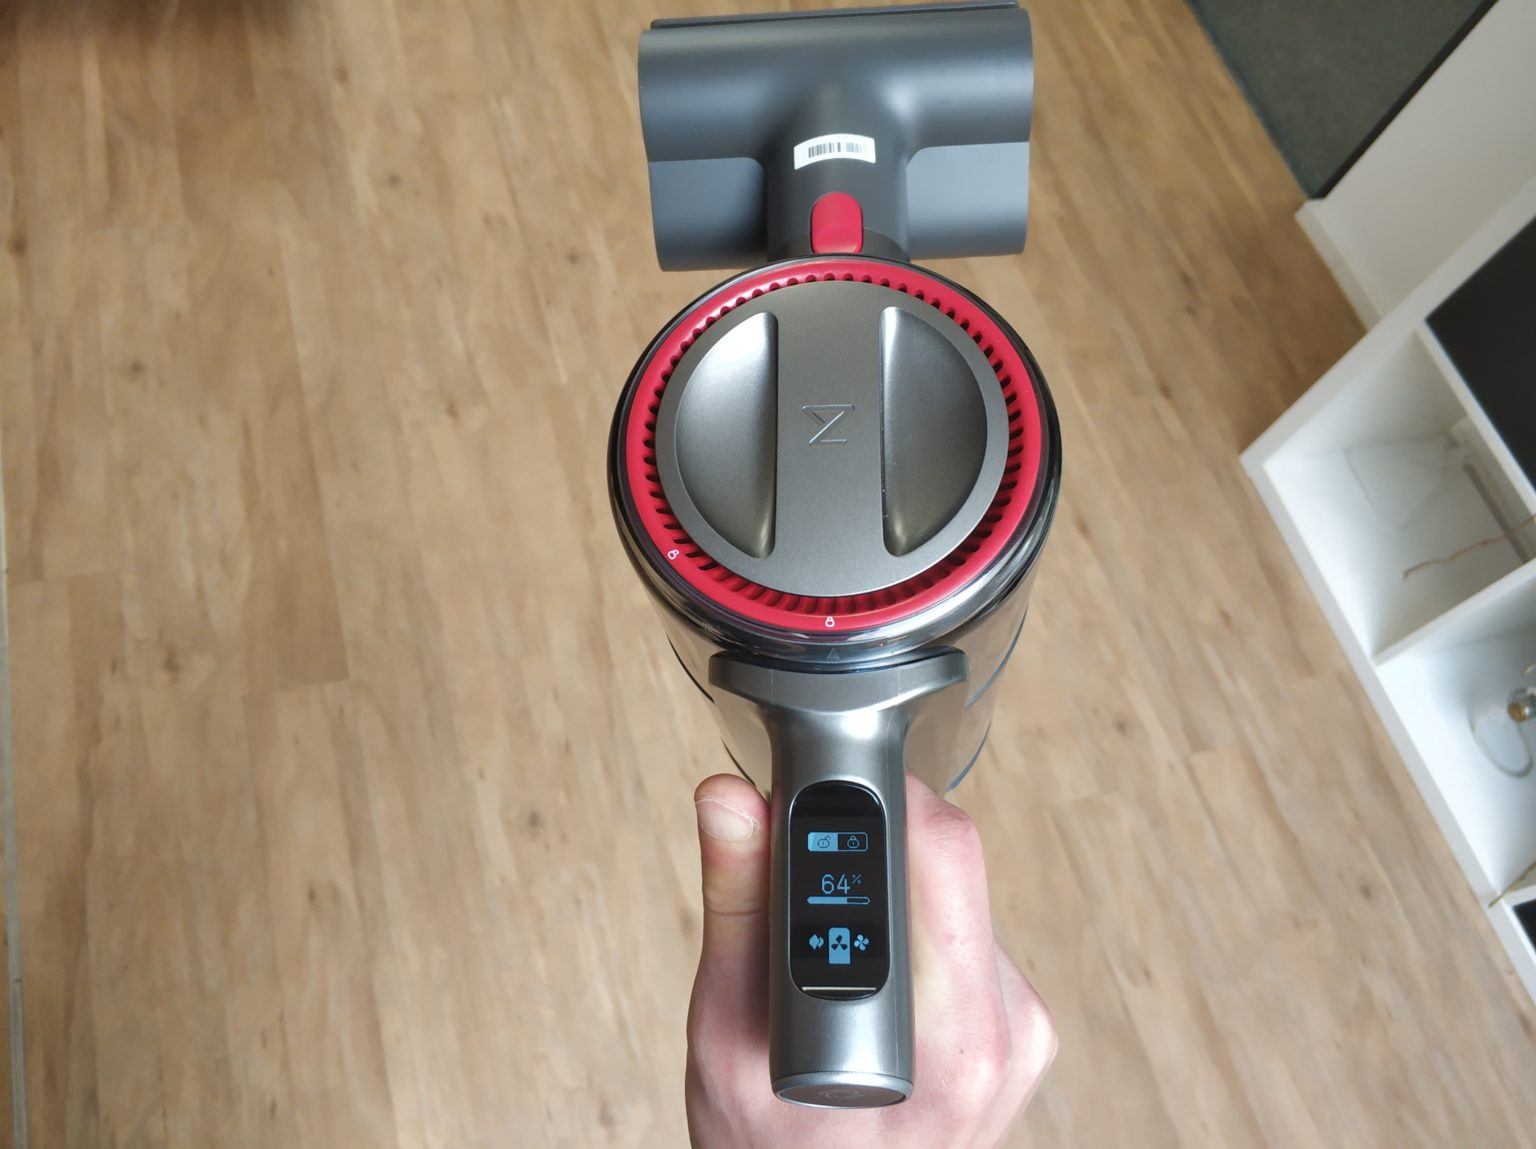 aspiradora inalámbrica Roborock H6 como aspiradora de mano